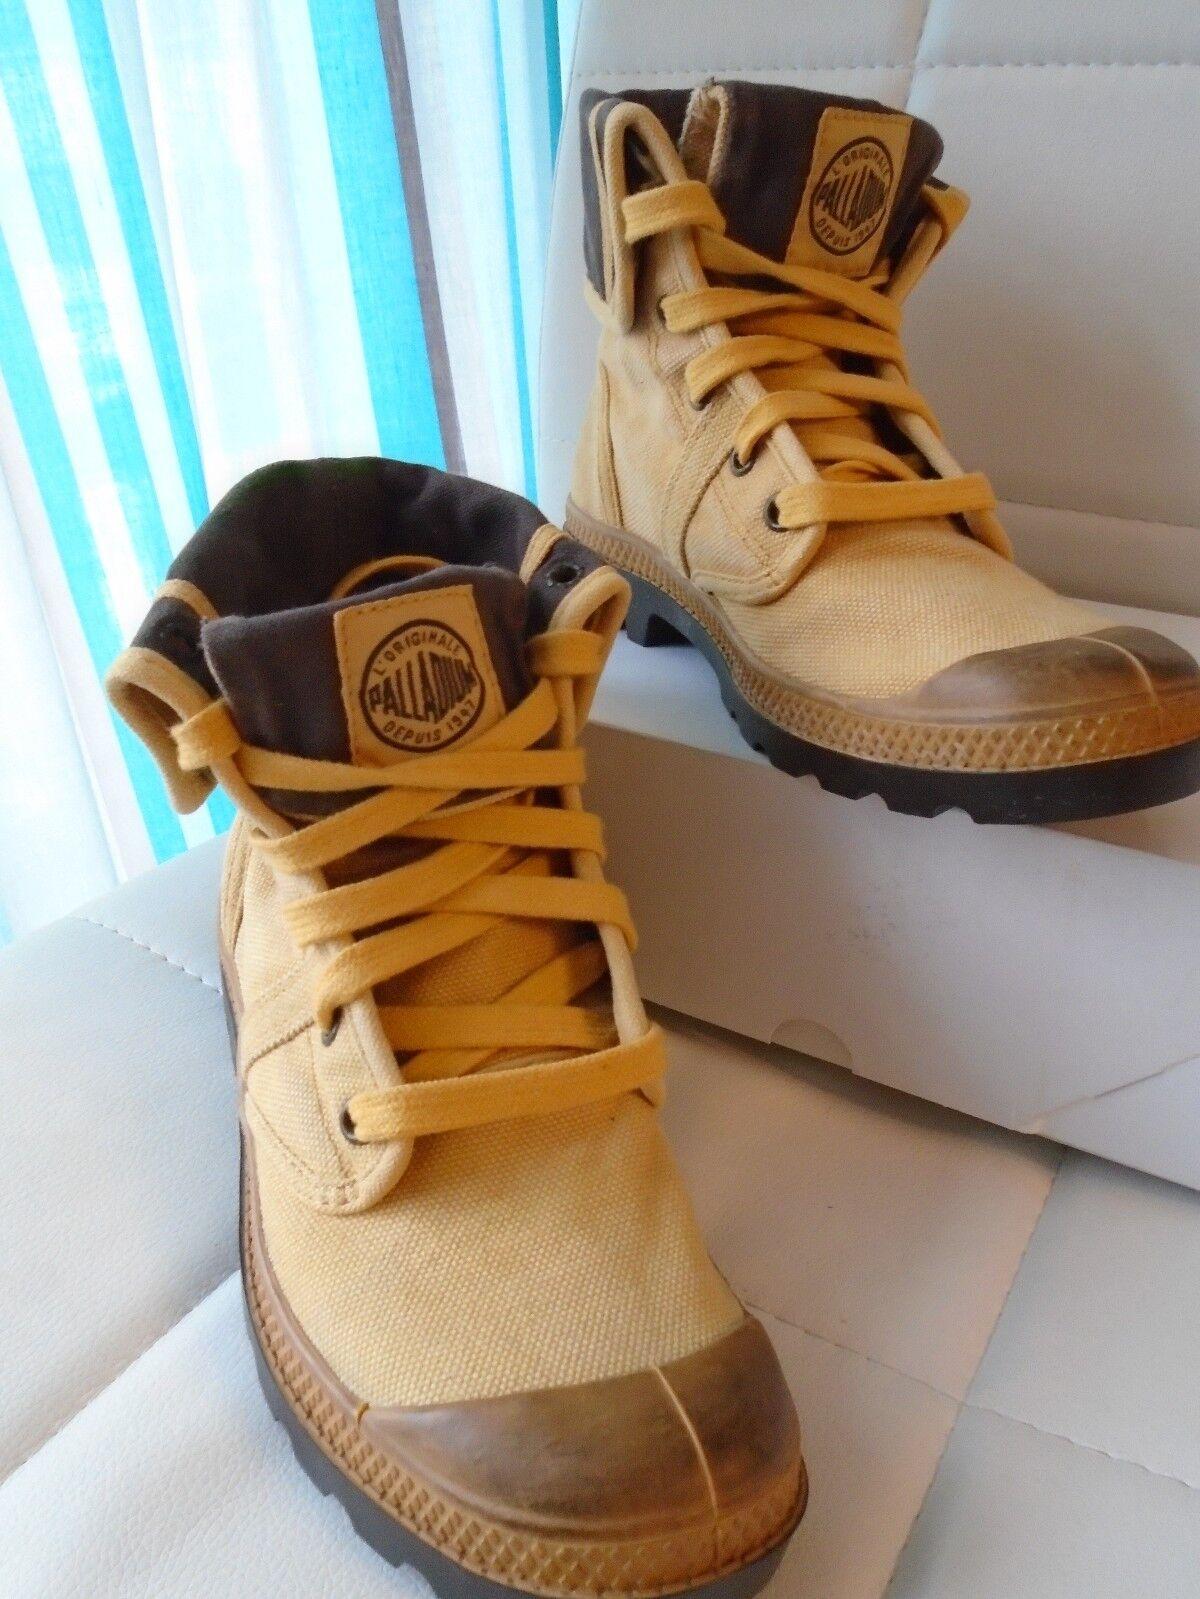 Palladium Damen Schnür-Boots Used 37 Look Boots Canvas hellbraun Größe 37 Used Neu f82f3c